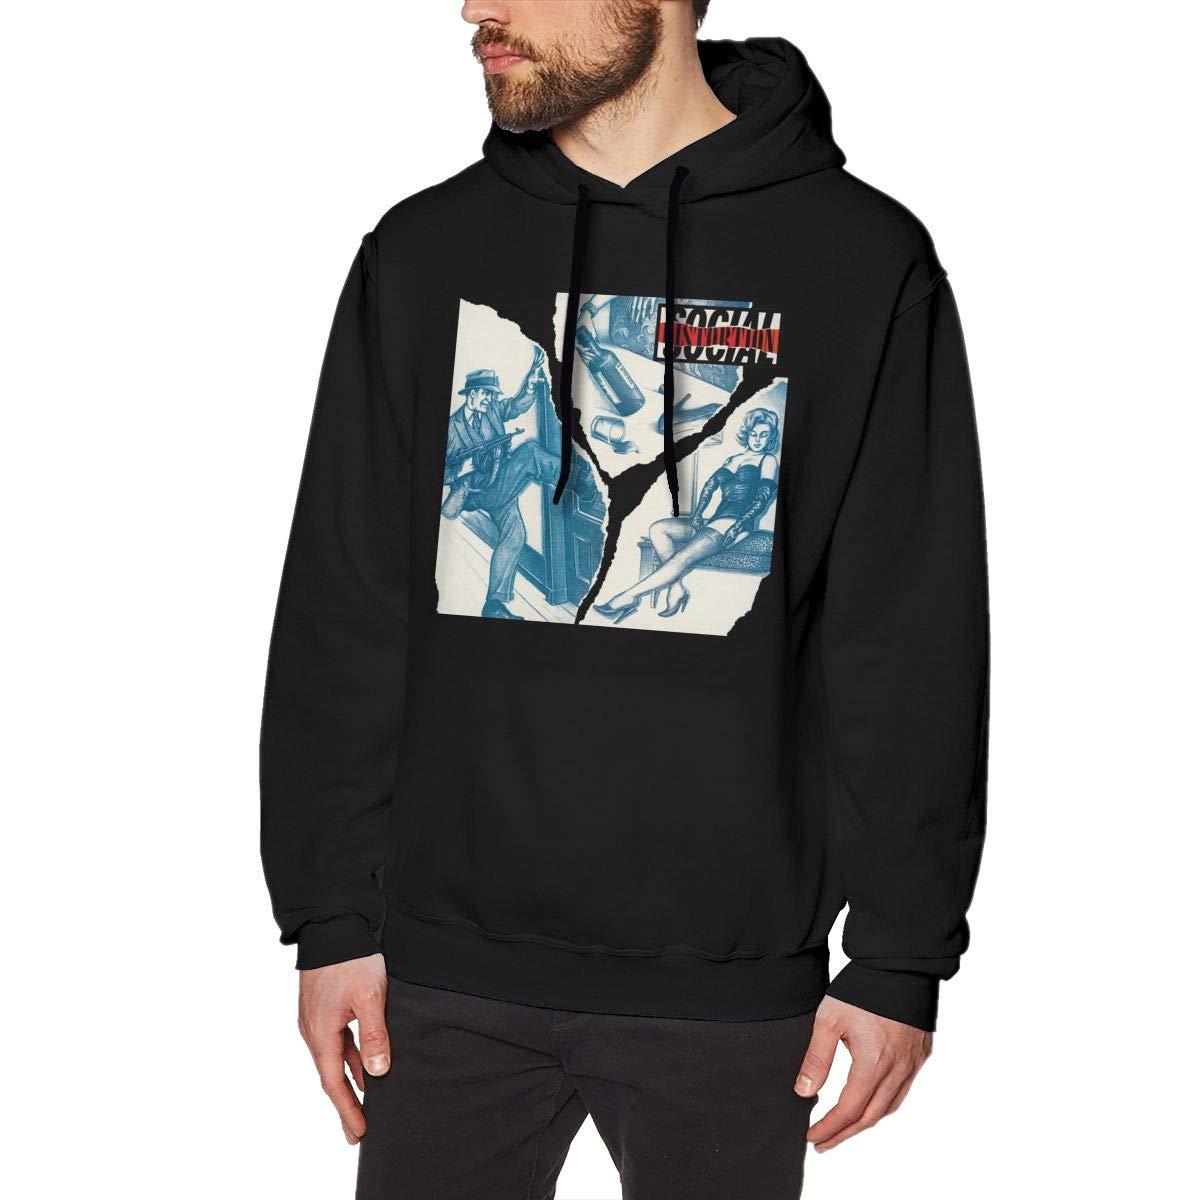 HorseTe Men Sweatshirts Suitable Social Distortion Poster Mens Sweater Black